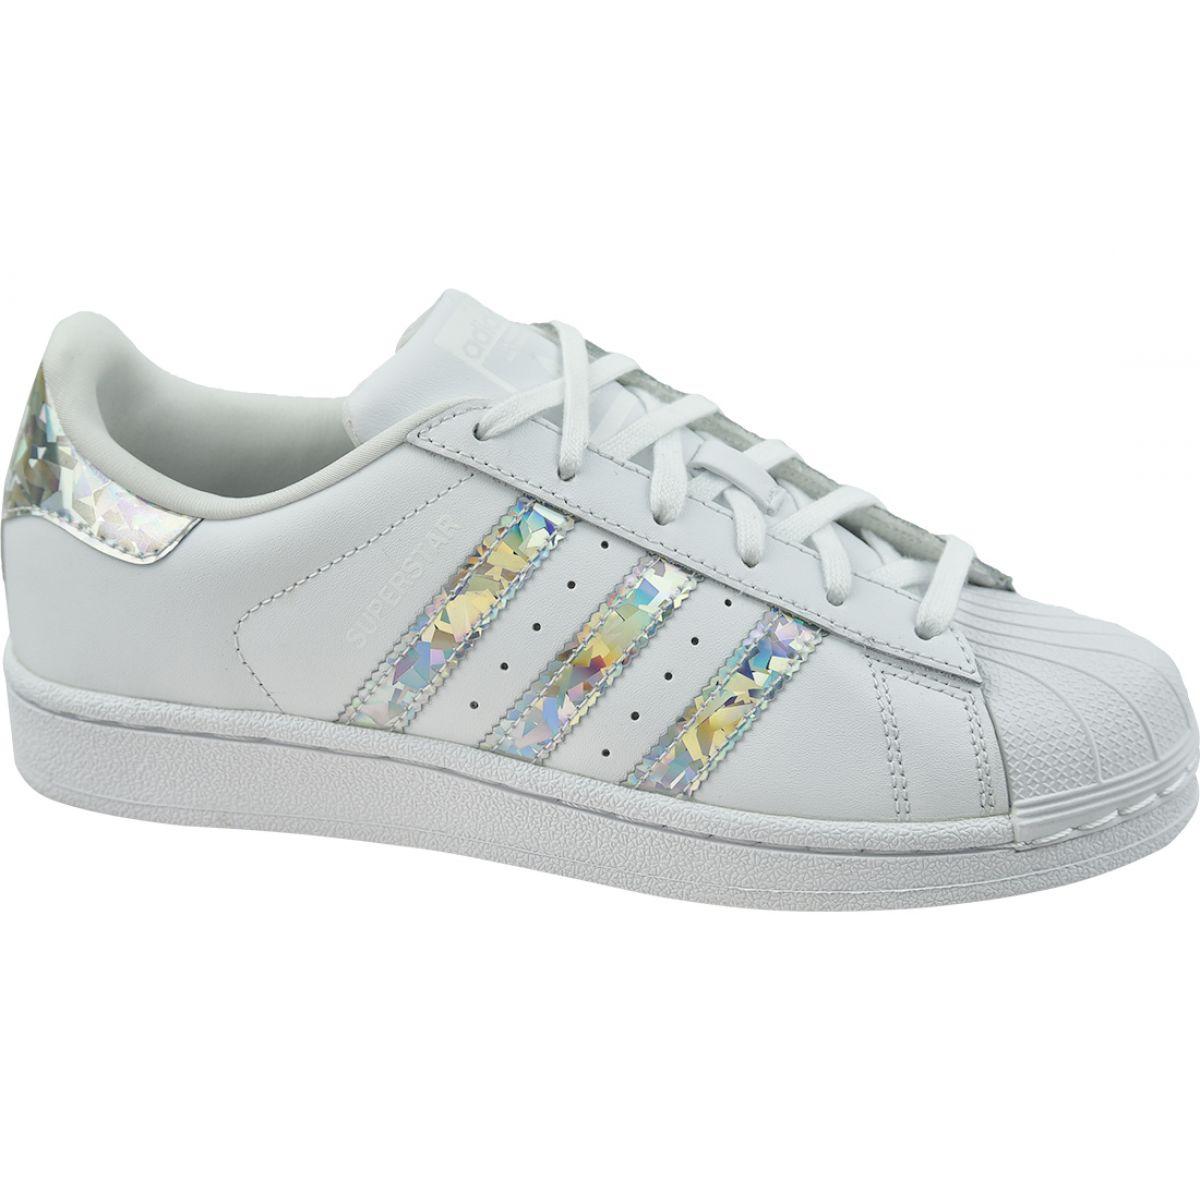 Adidas Originals Superstar Jr F33889 schoenen wit